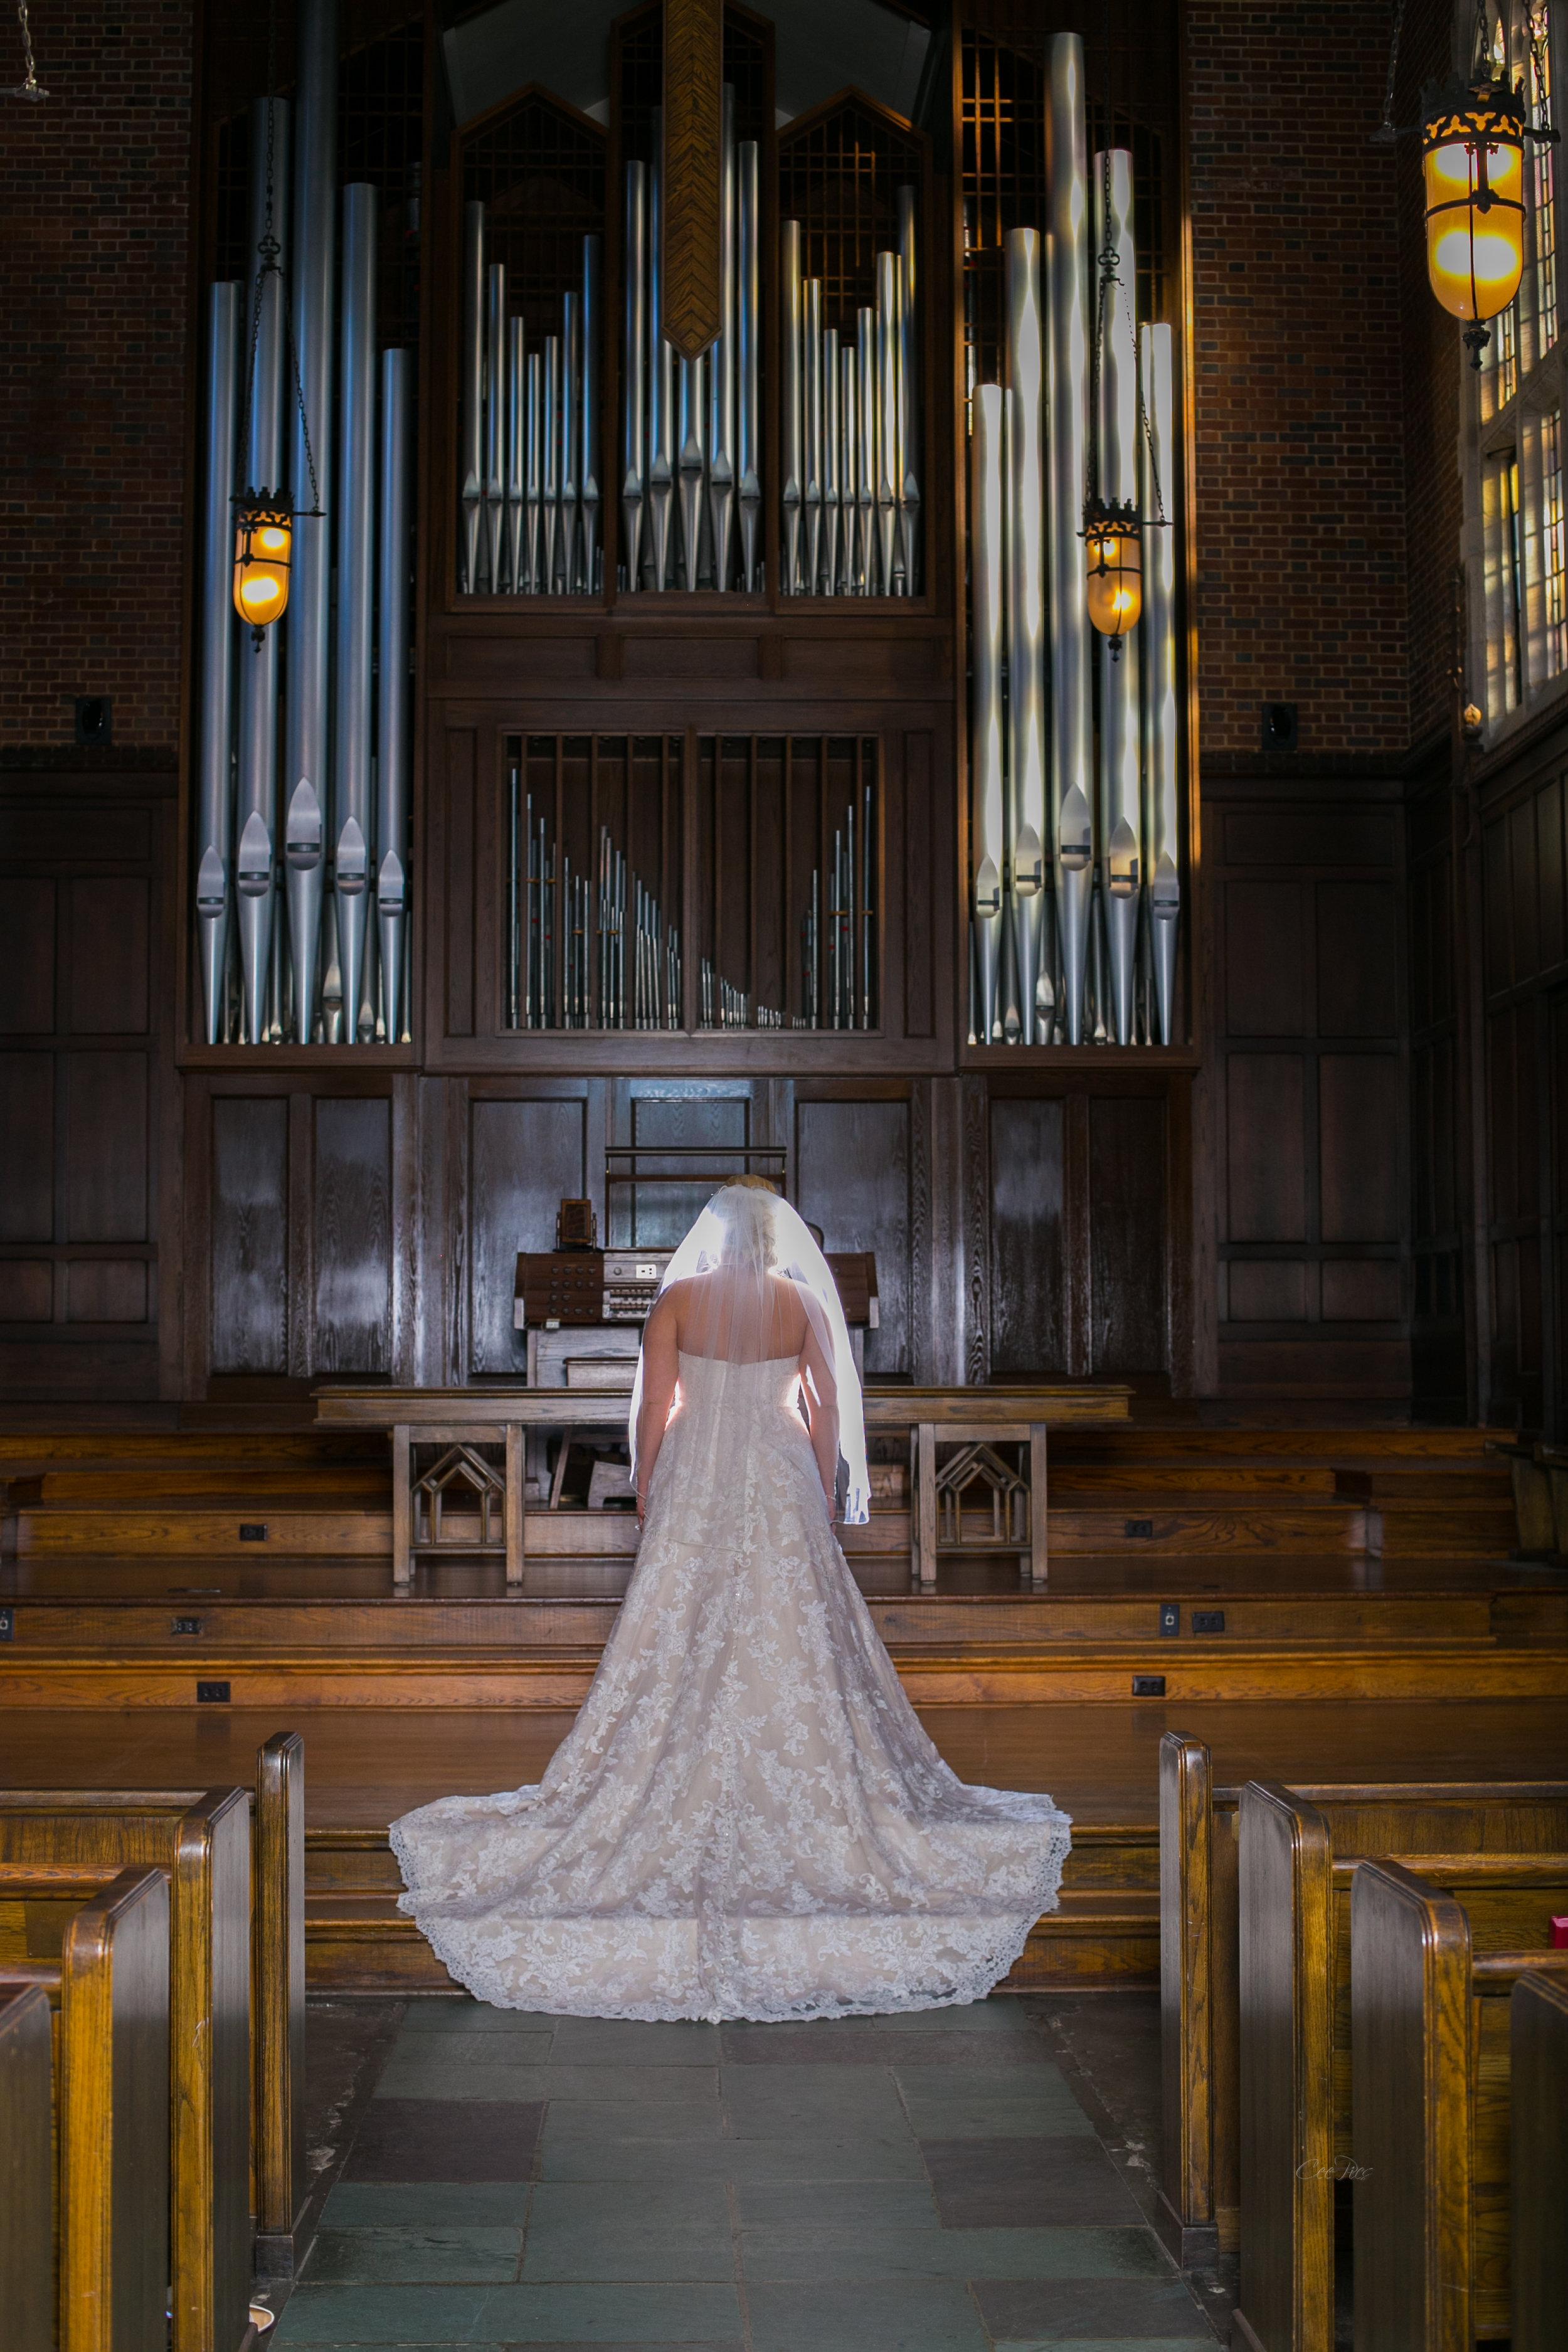 Nashville_Wedding_Photographer_Photography_DJ_MC_Lighting_Photobooth_Franklin_Bowling_Gallatin3-49.jpg